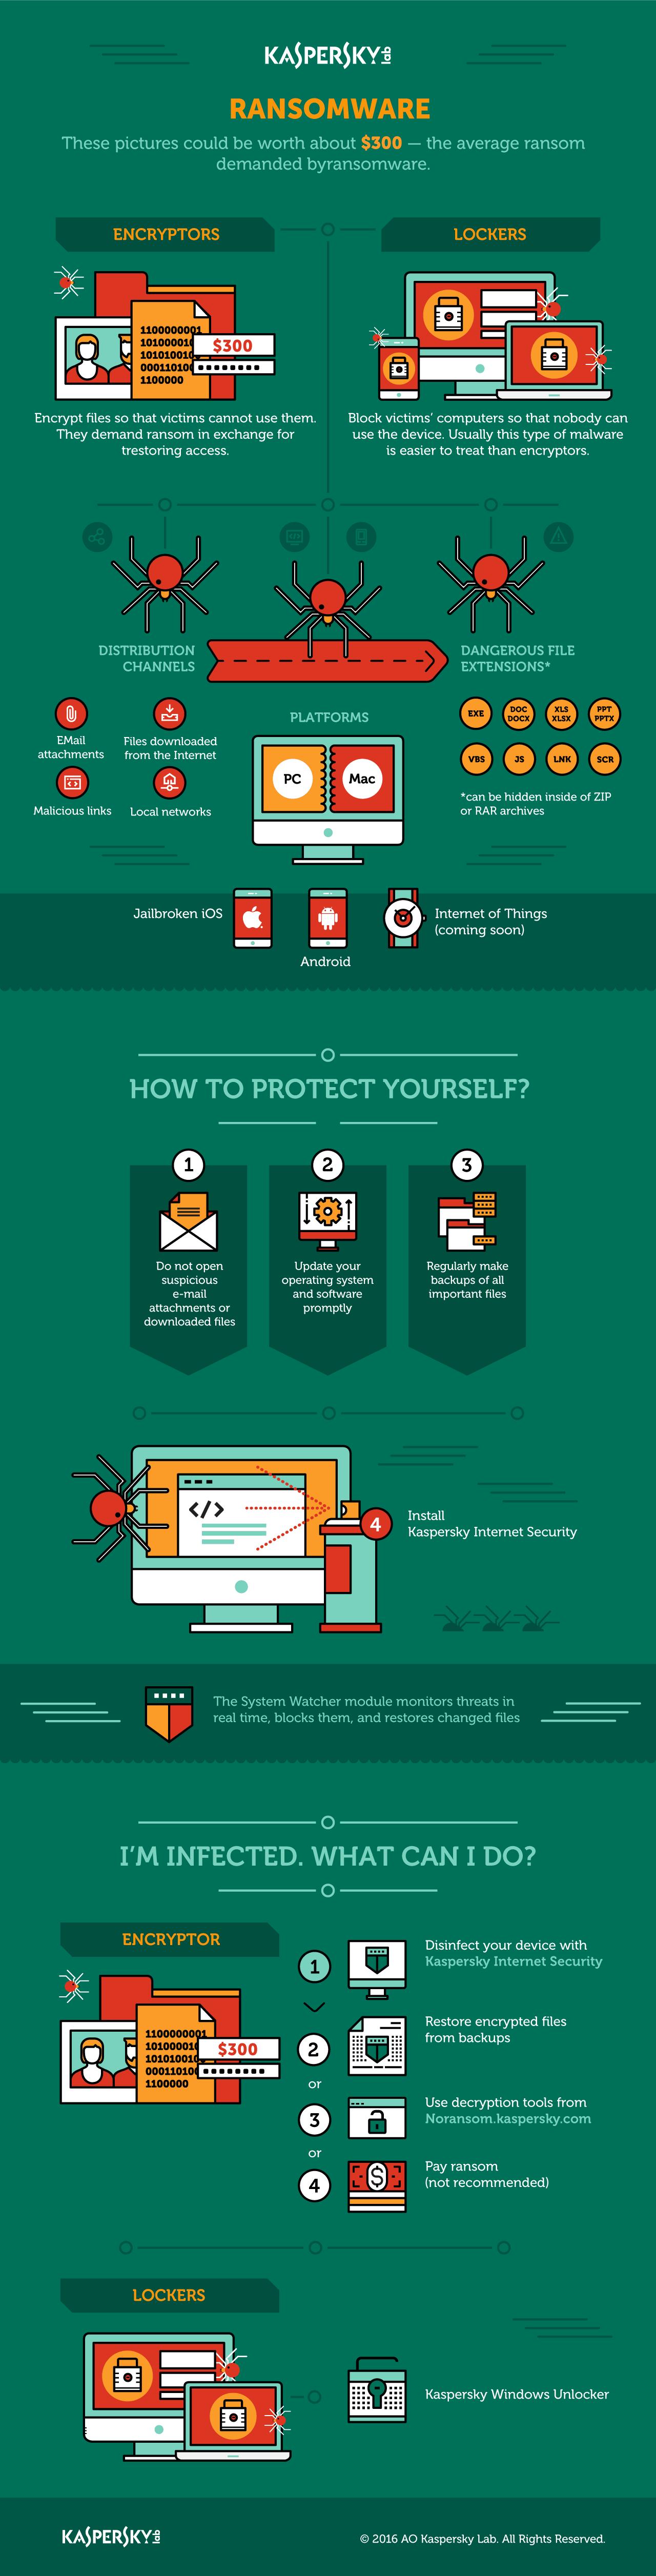 ransomware-ig-en